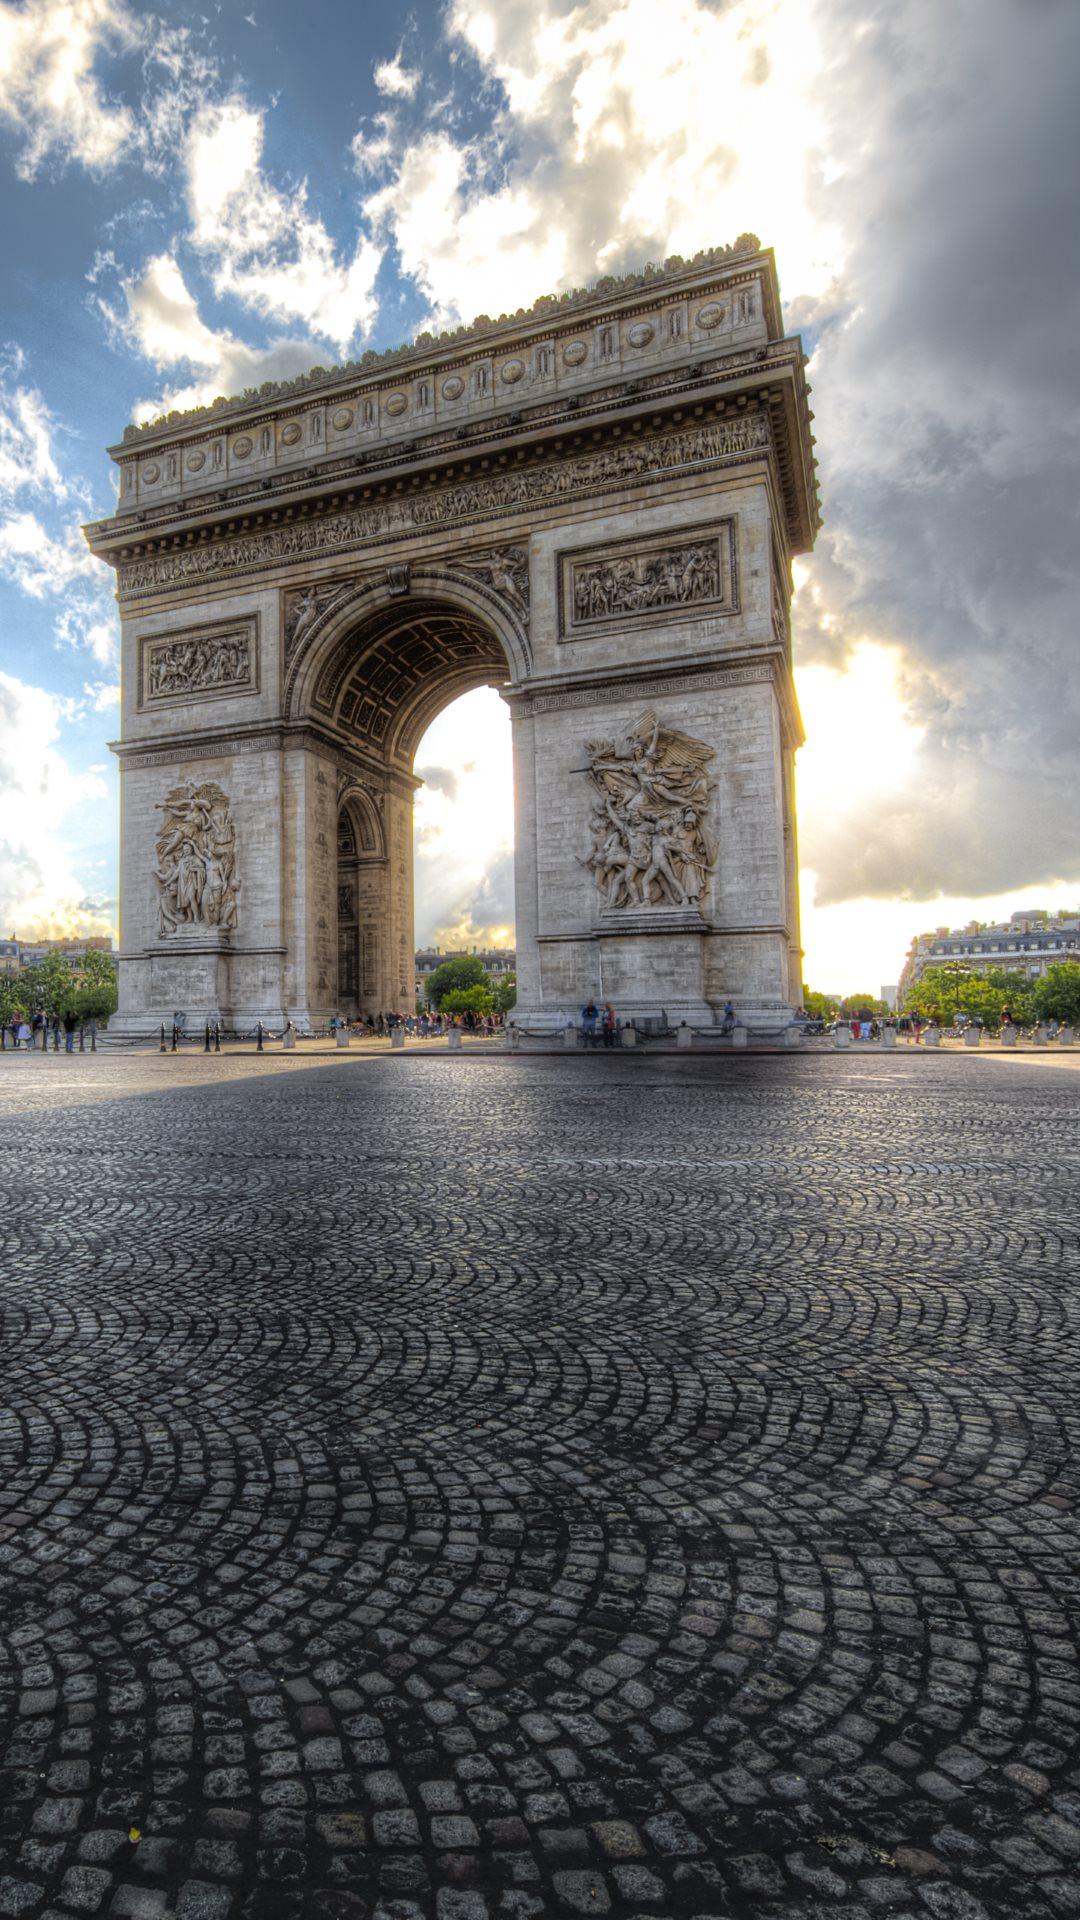 arc de triomphe hd - photo #25